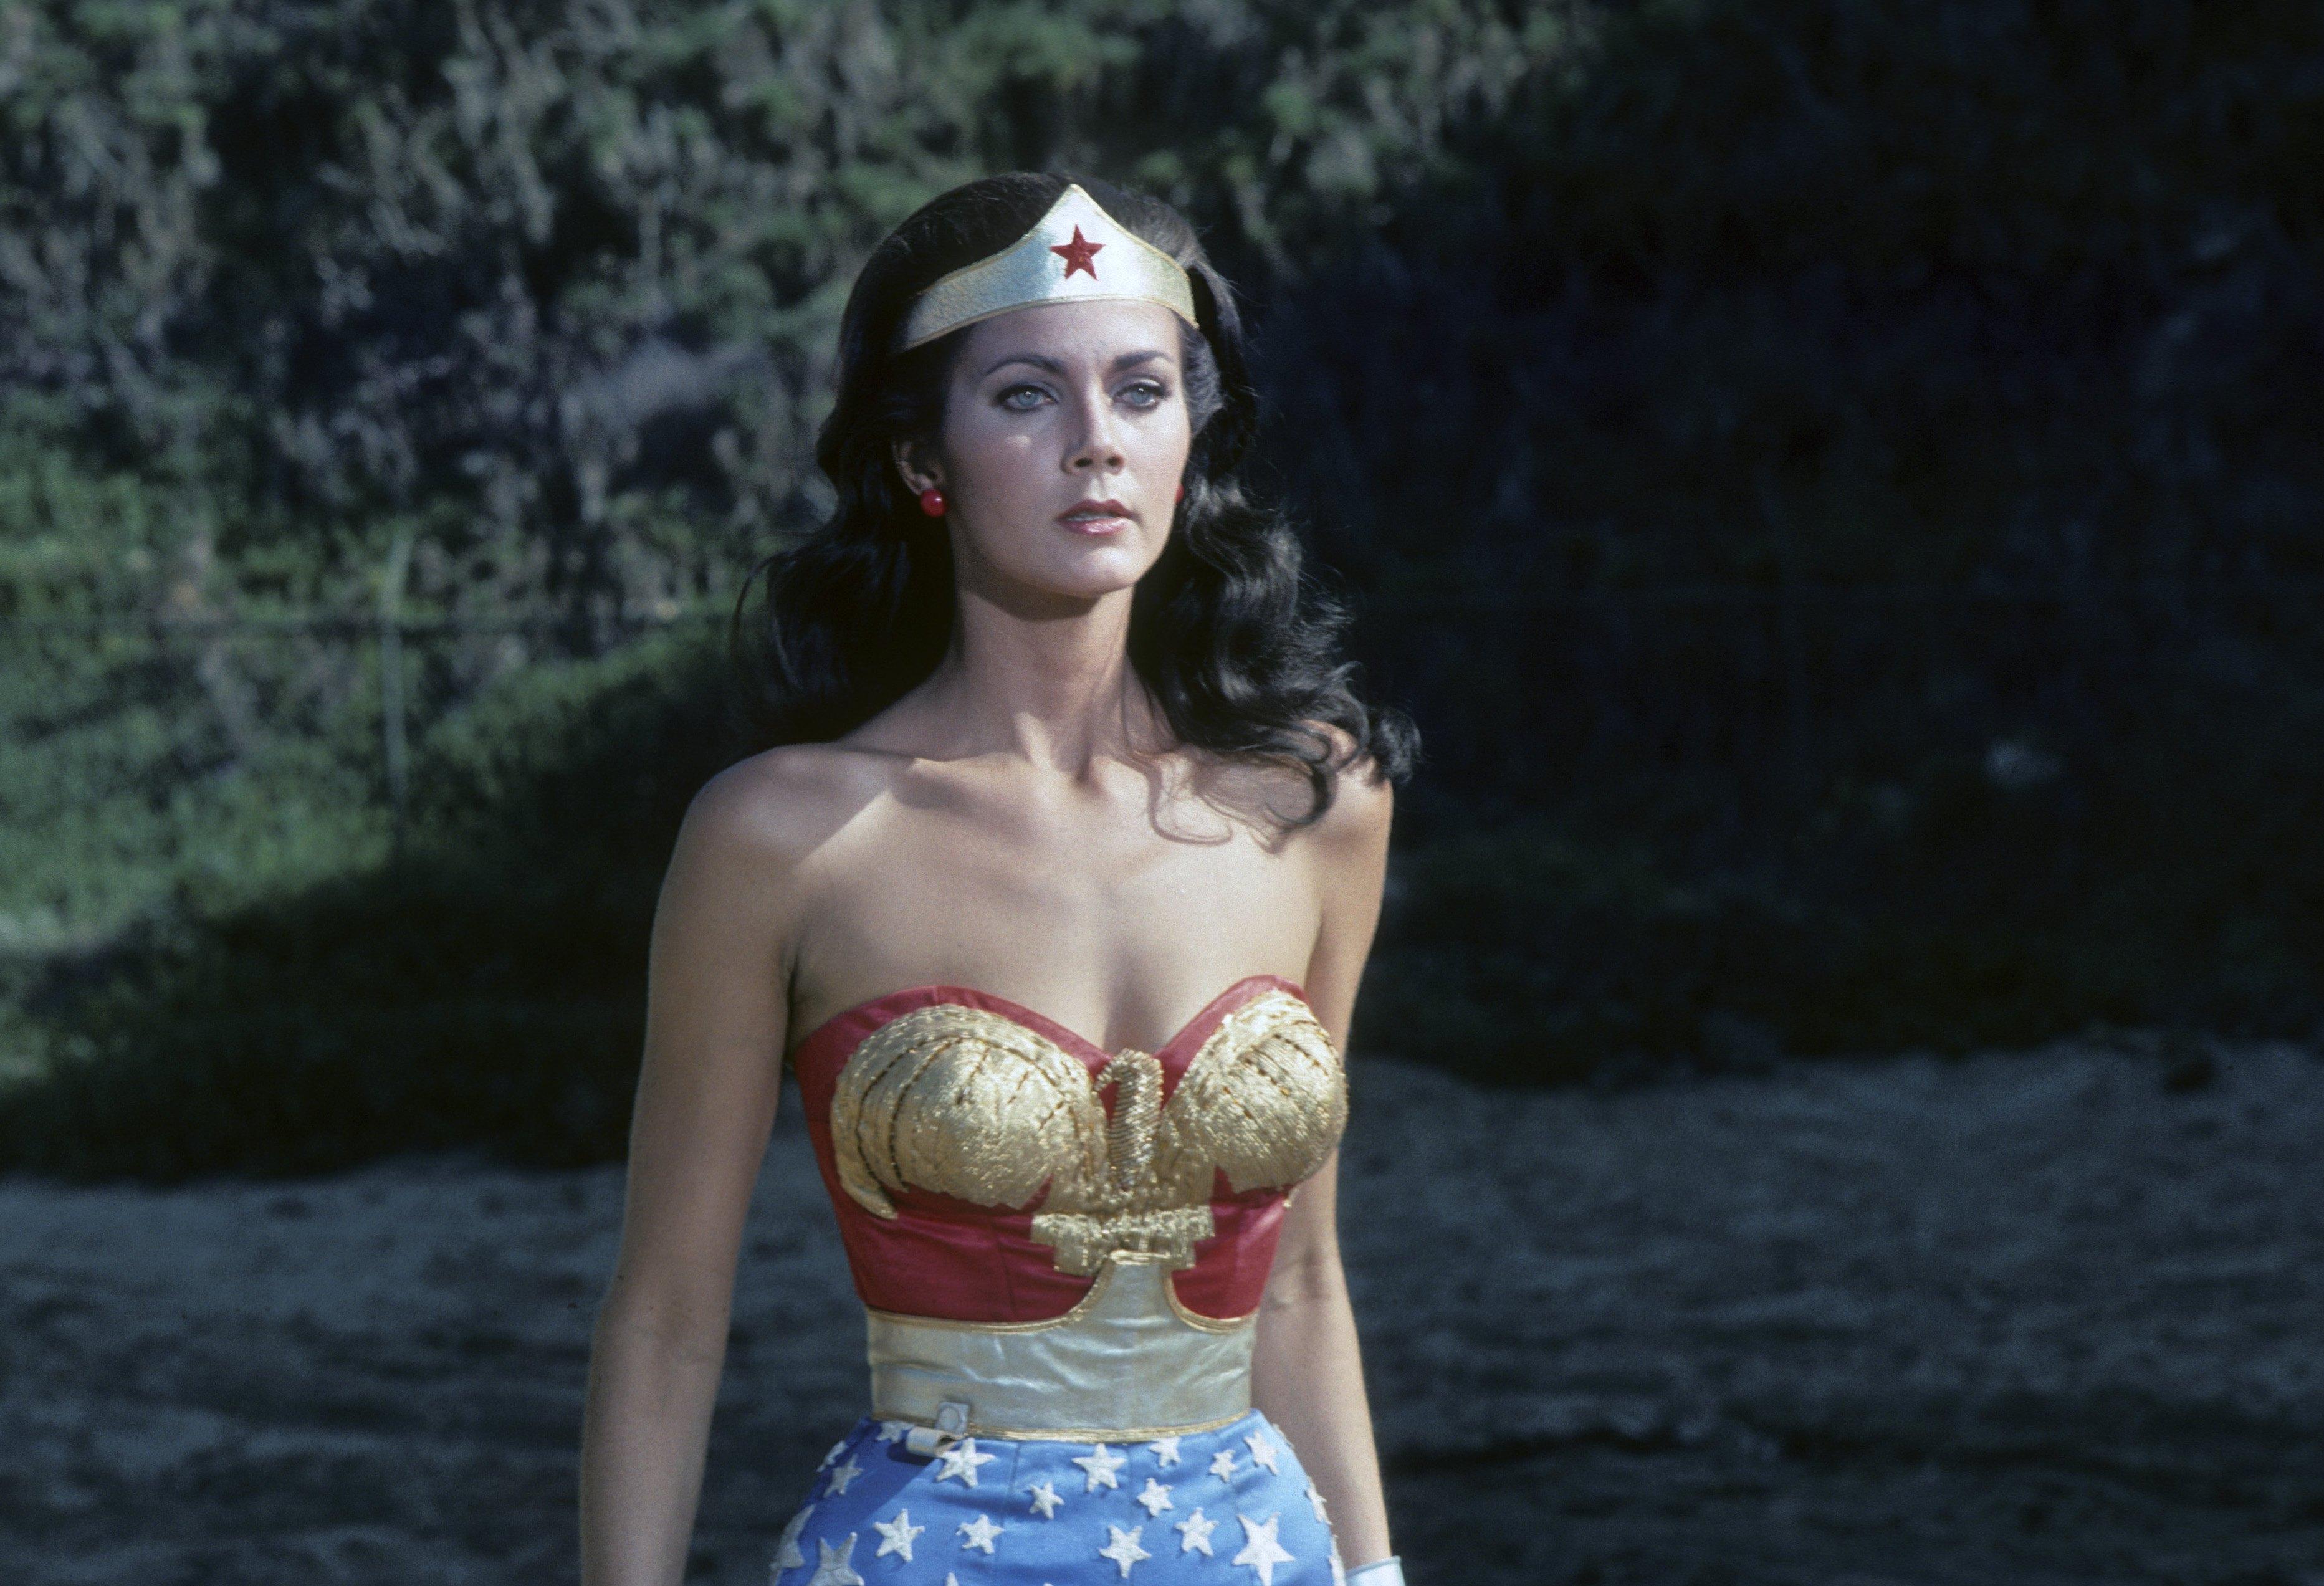 Lynda Carter as Wonder Woman on January 22, 1977.